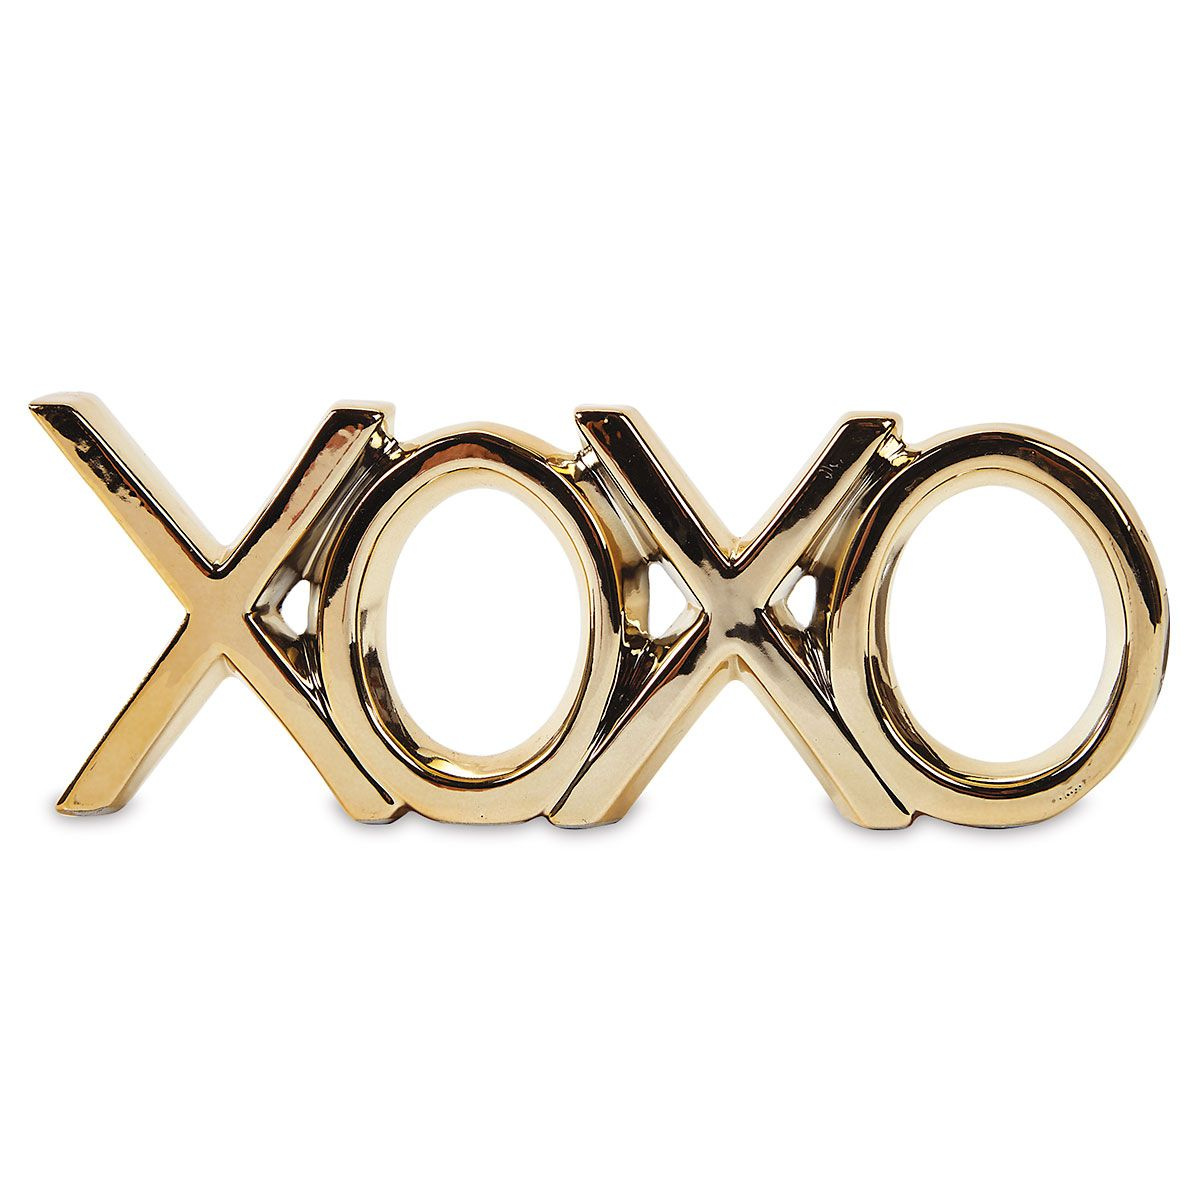 XOXO Metallic Gold-Dipped Decoration